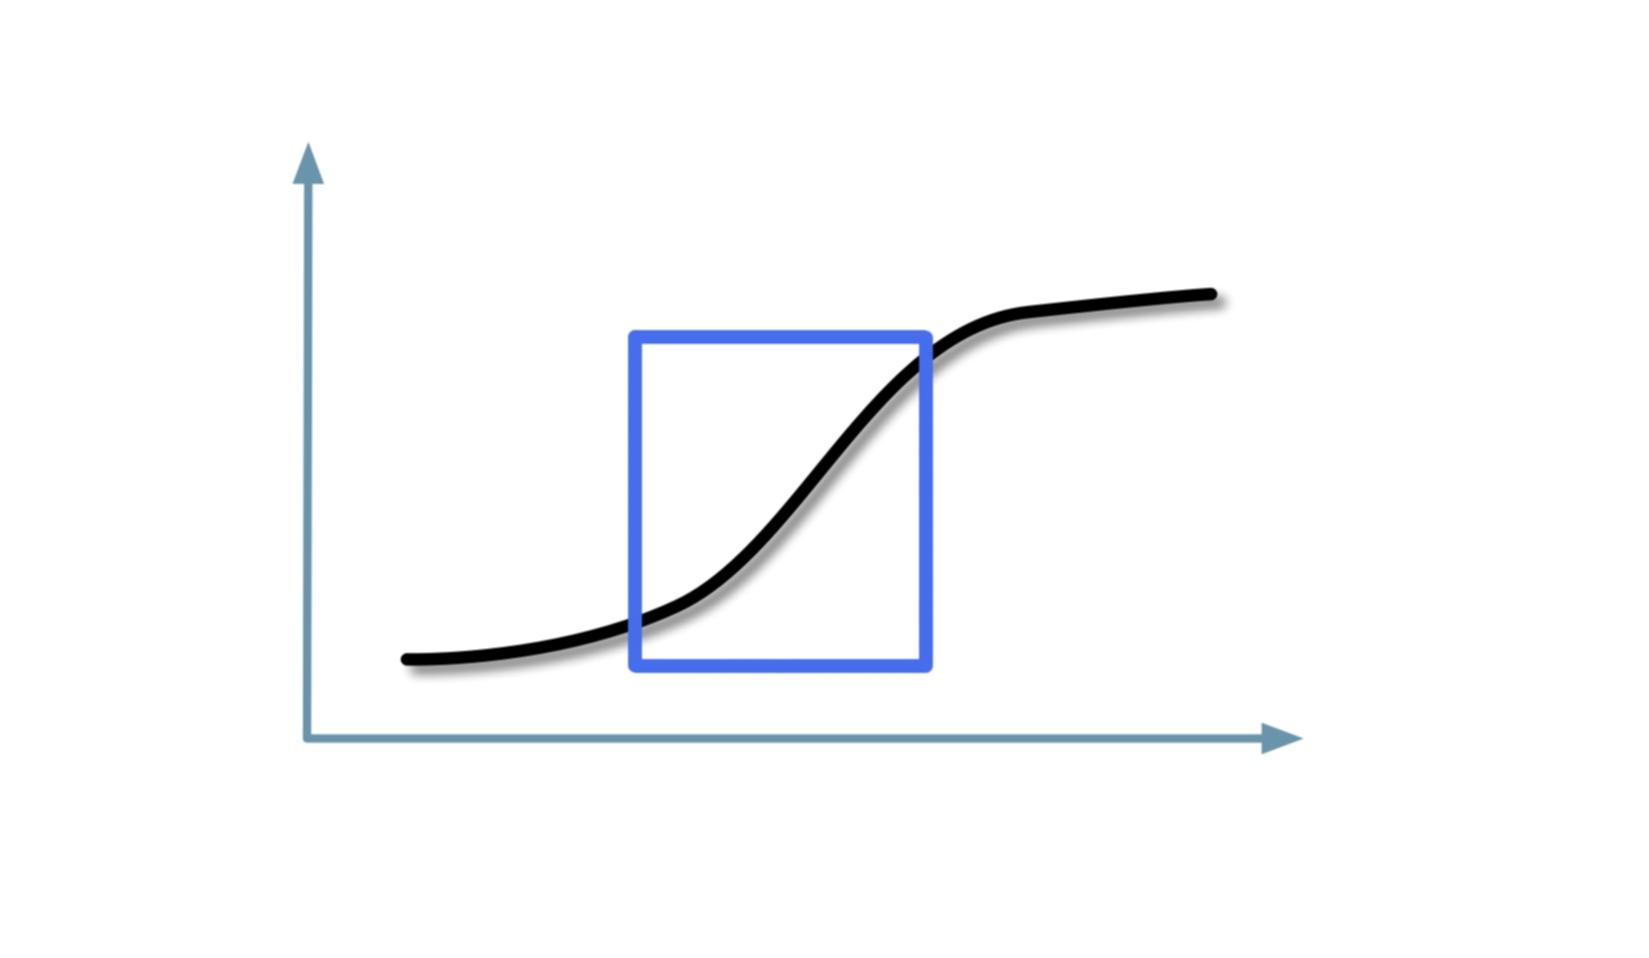 innovation-s-curve-2.jpg